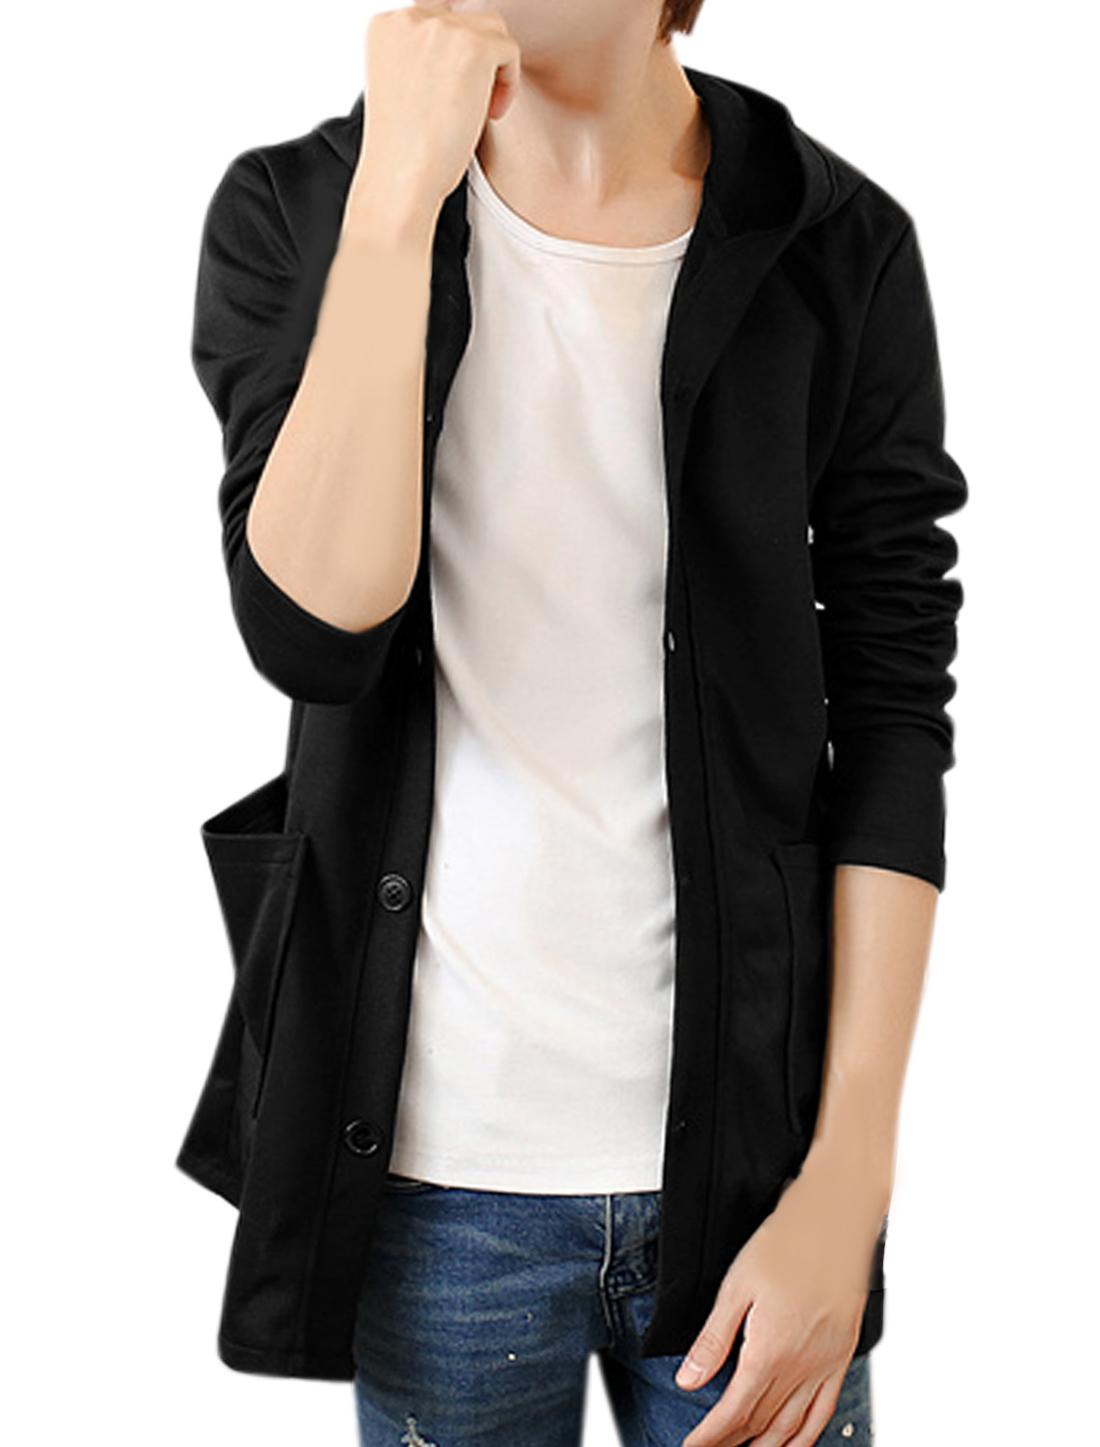 Men Long Sleeve Single Breasted Front Pockets Slim Fit Hooded Jacket Black S